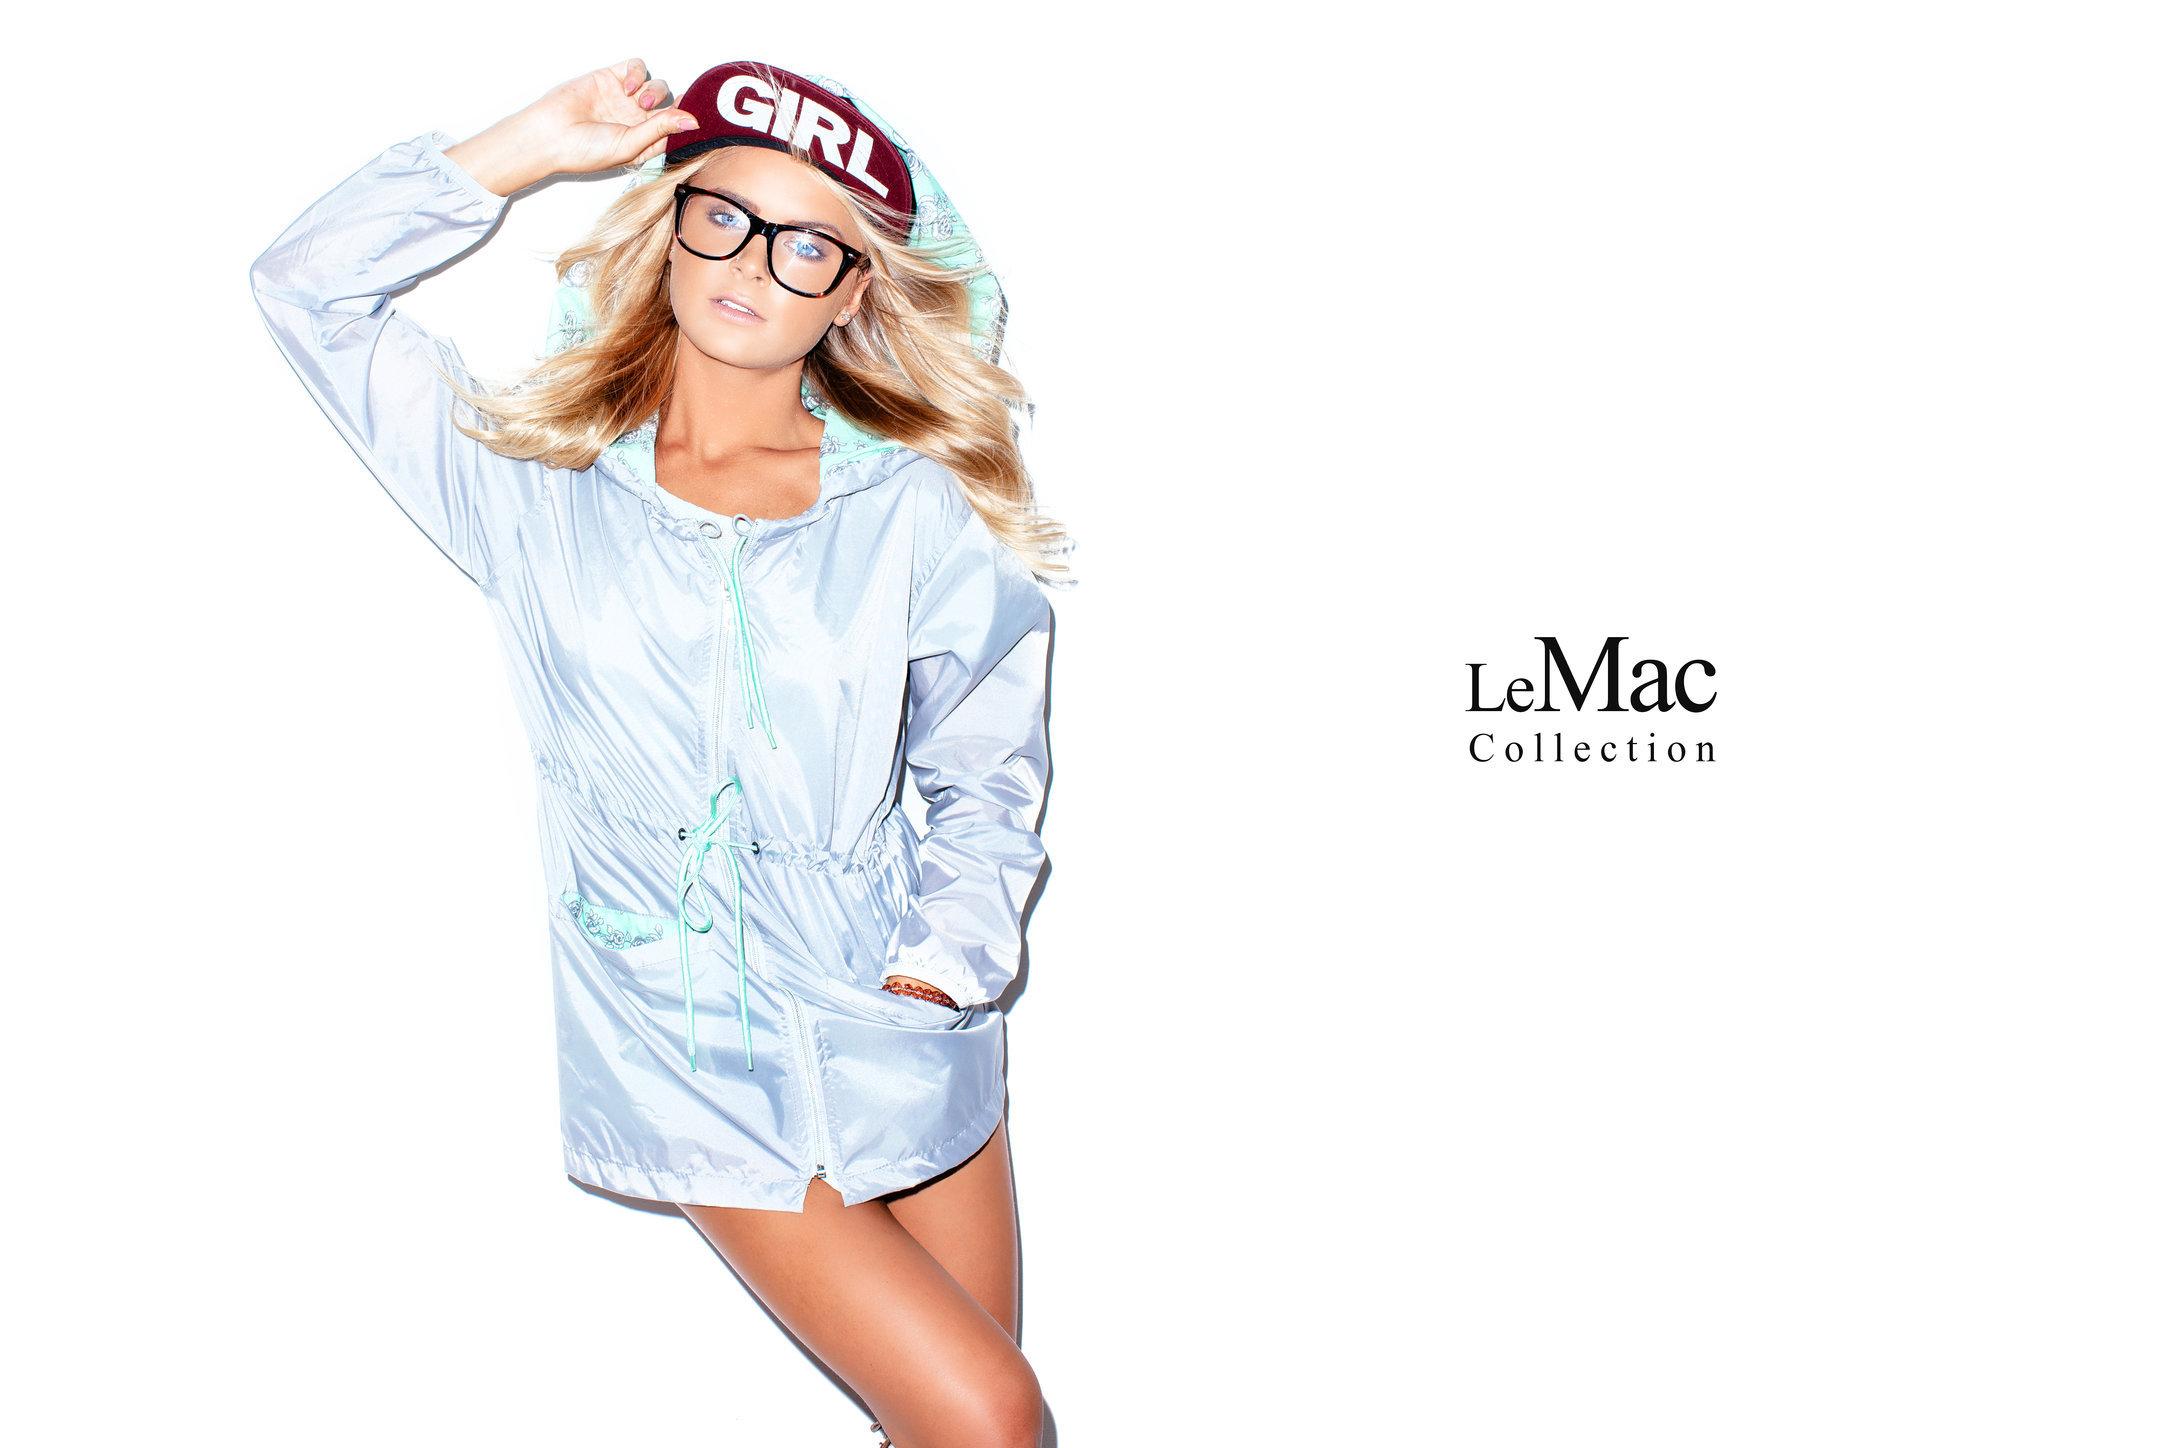 LeMac S/S14